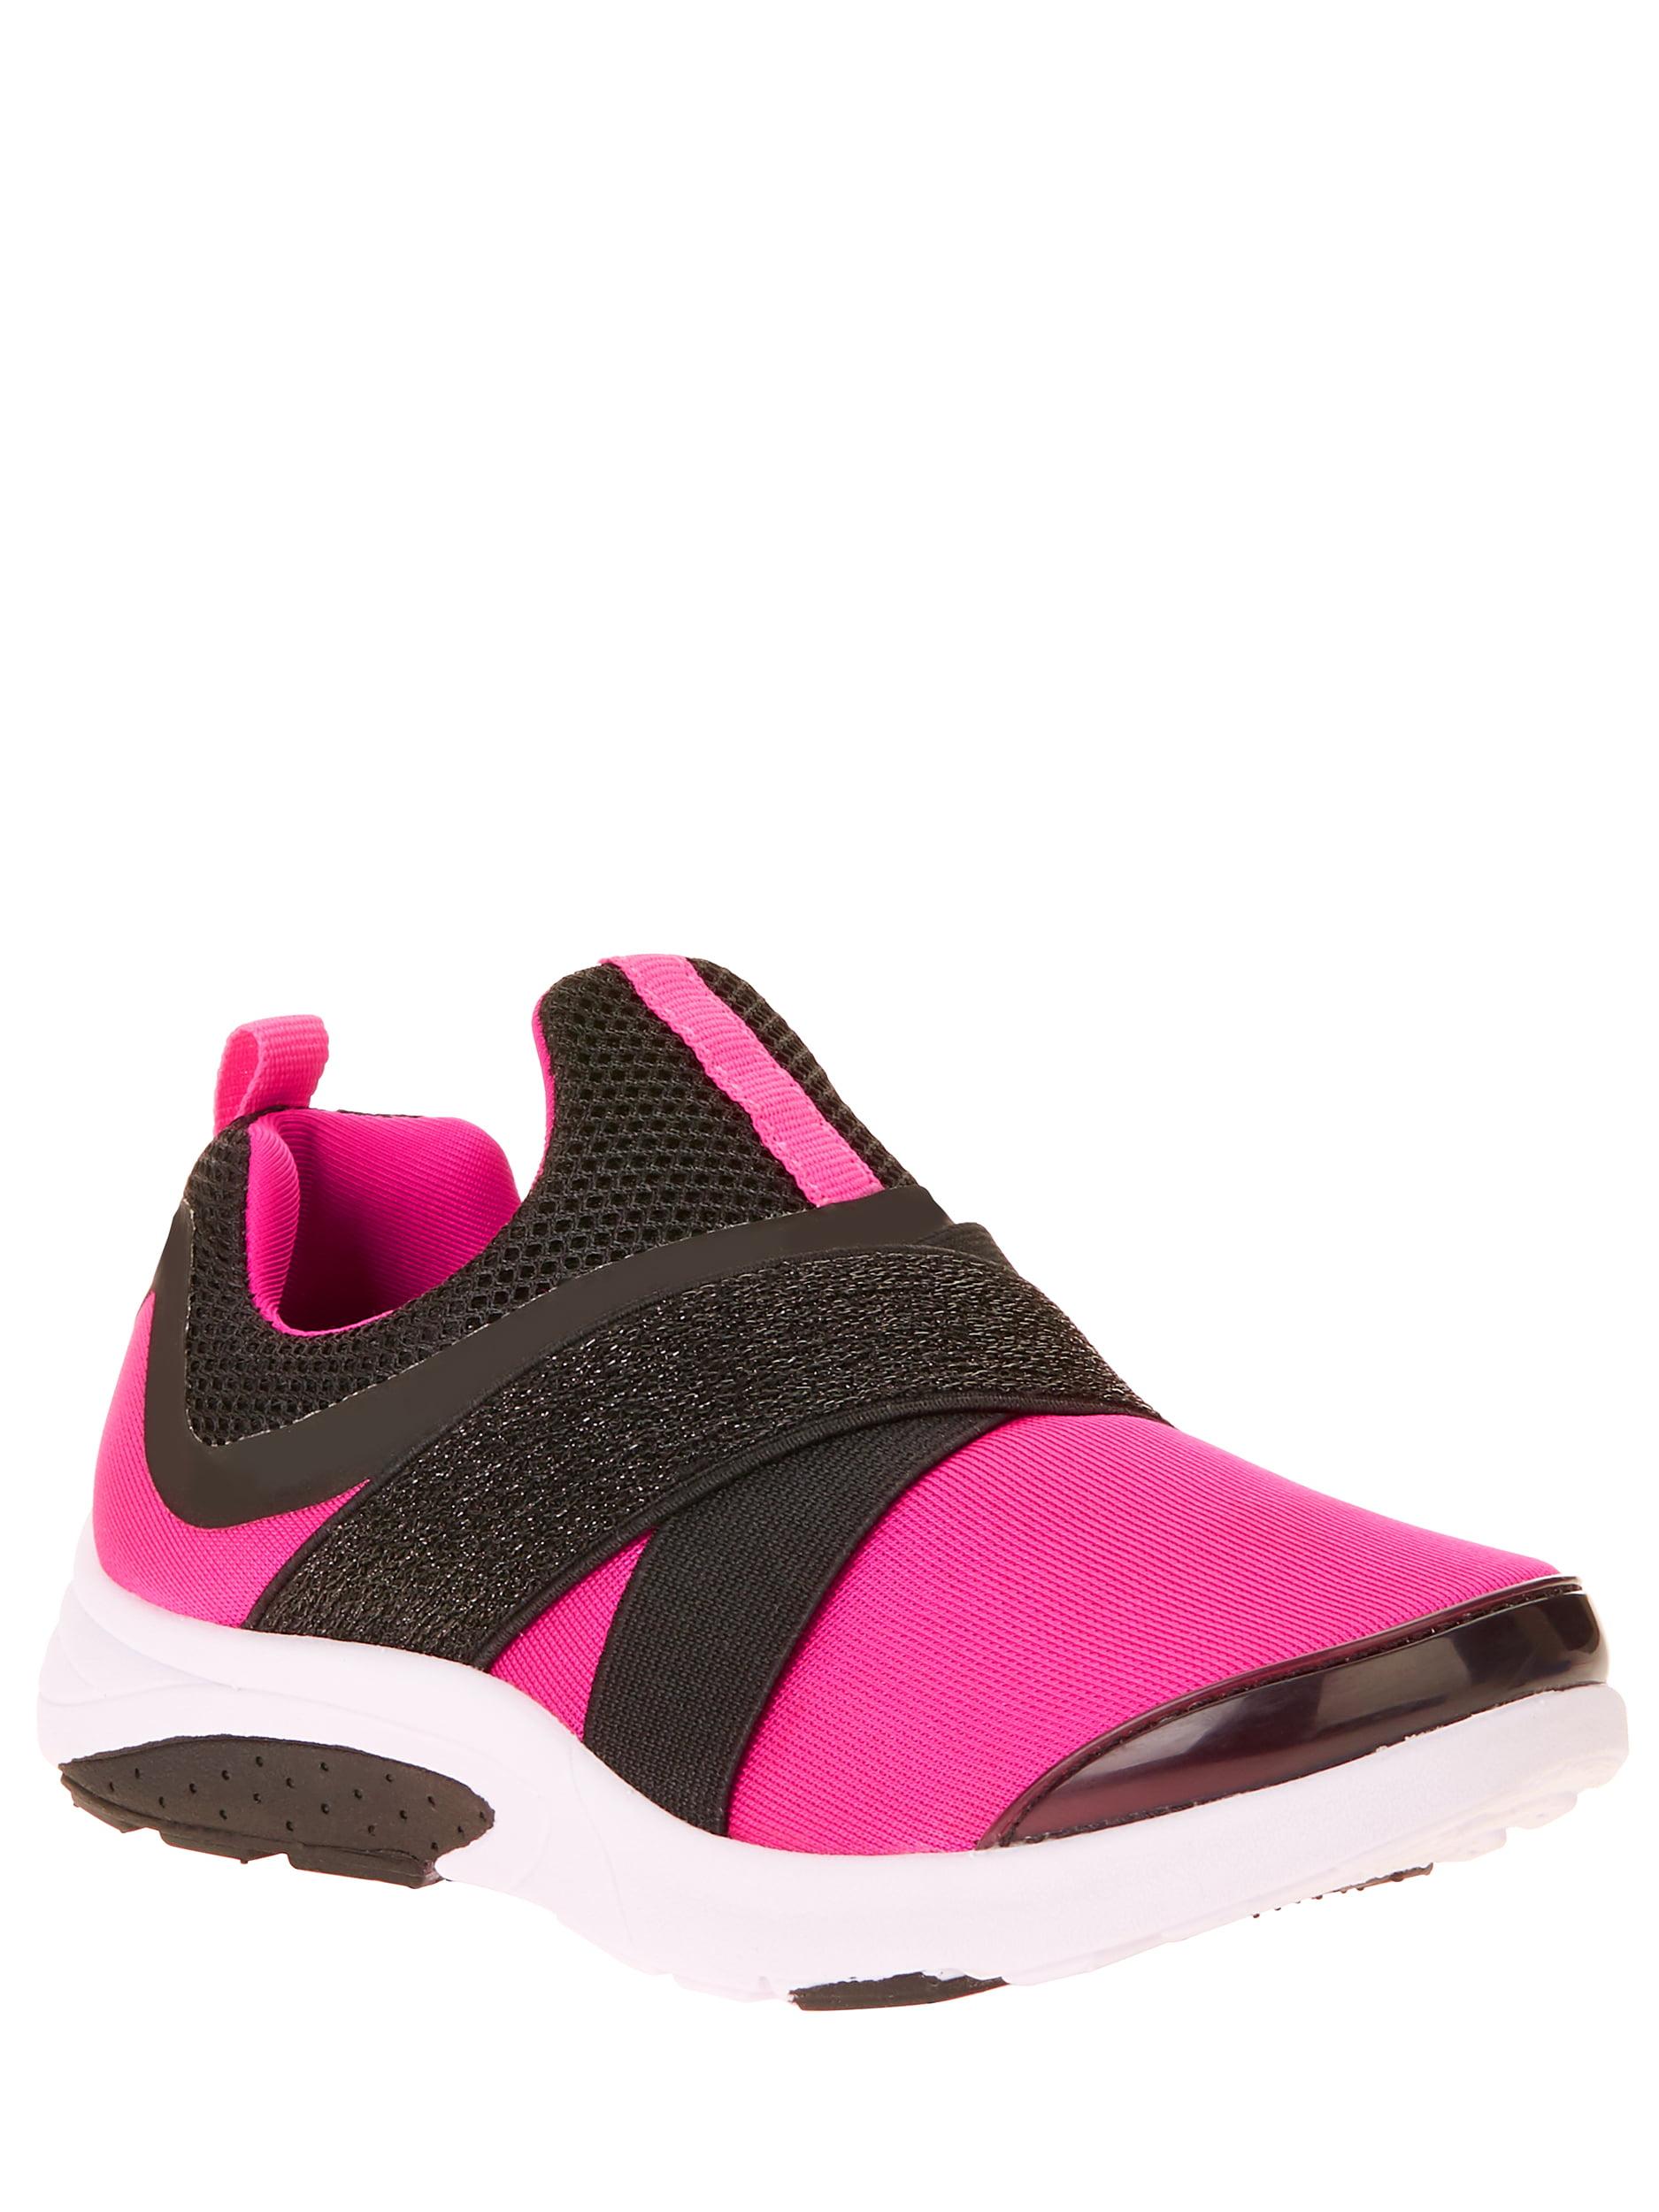 Athletic Works Girls' Slip On Running Shoe - Walmart.com - Walmart.com